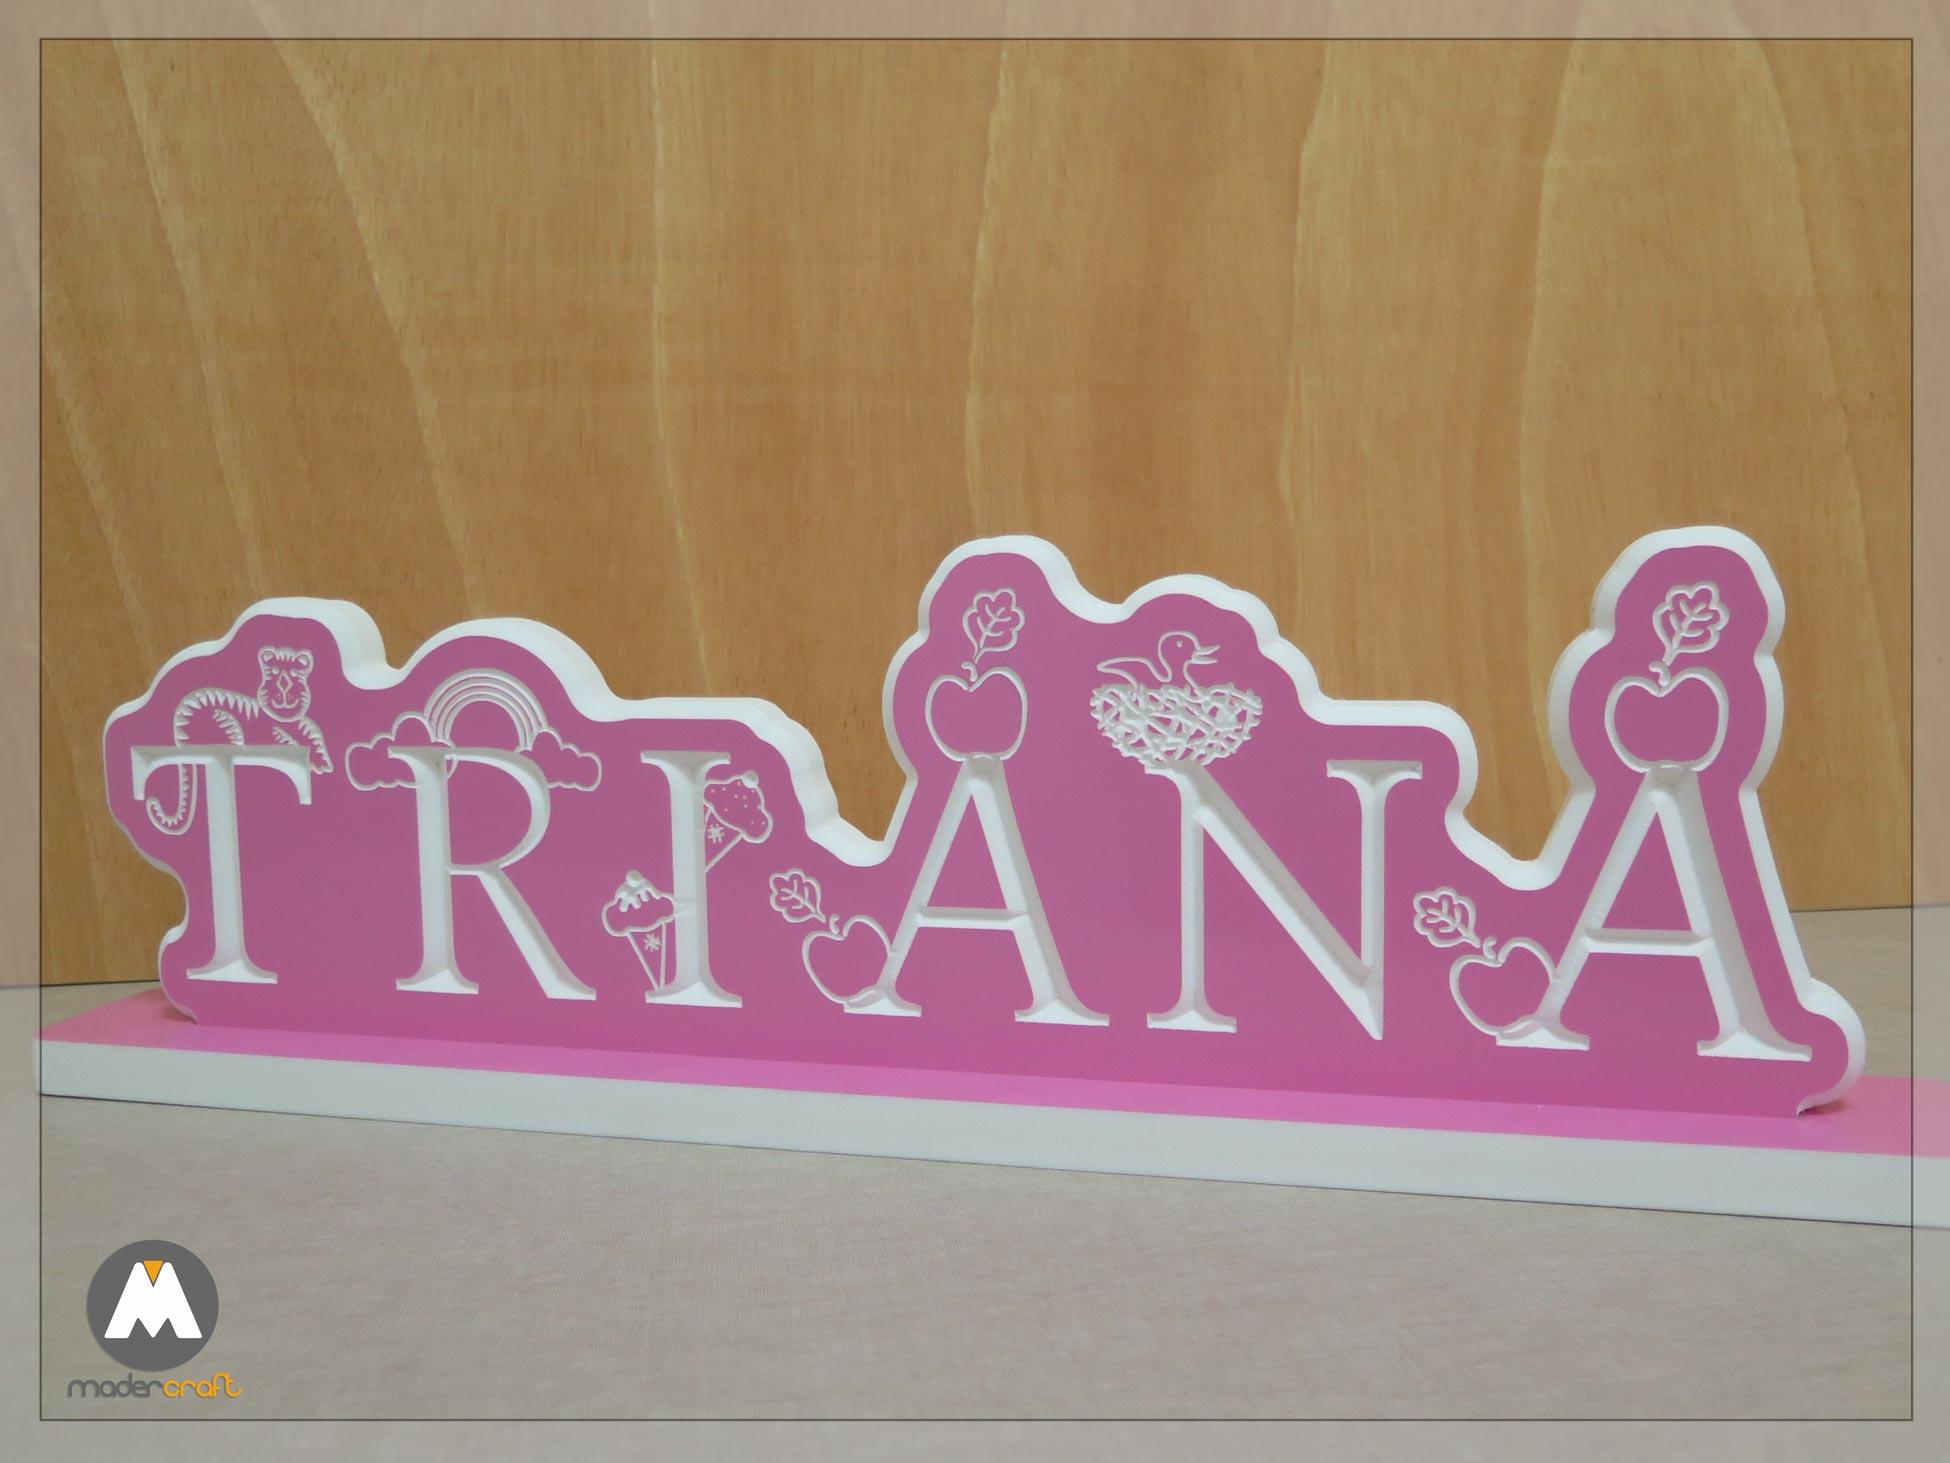 Placa PVC Nombre Infantil Triana, personalizada colores rosa niña vinilo tallada motivo letras disney arcoiris manzana alfabeto inglés.